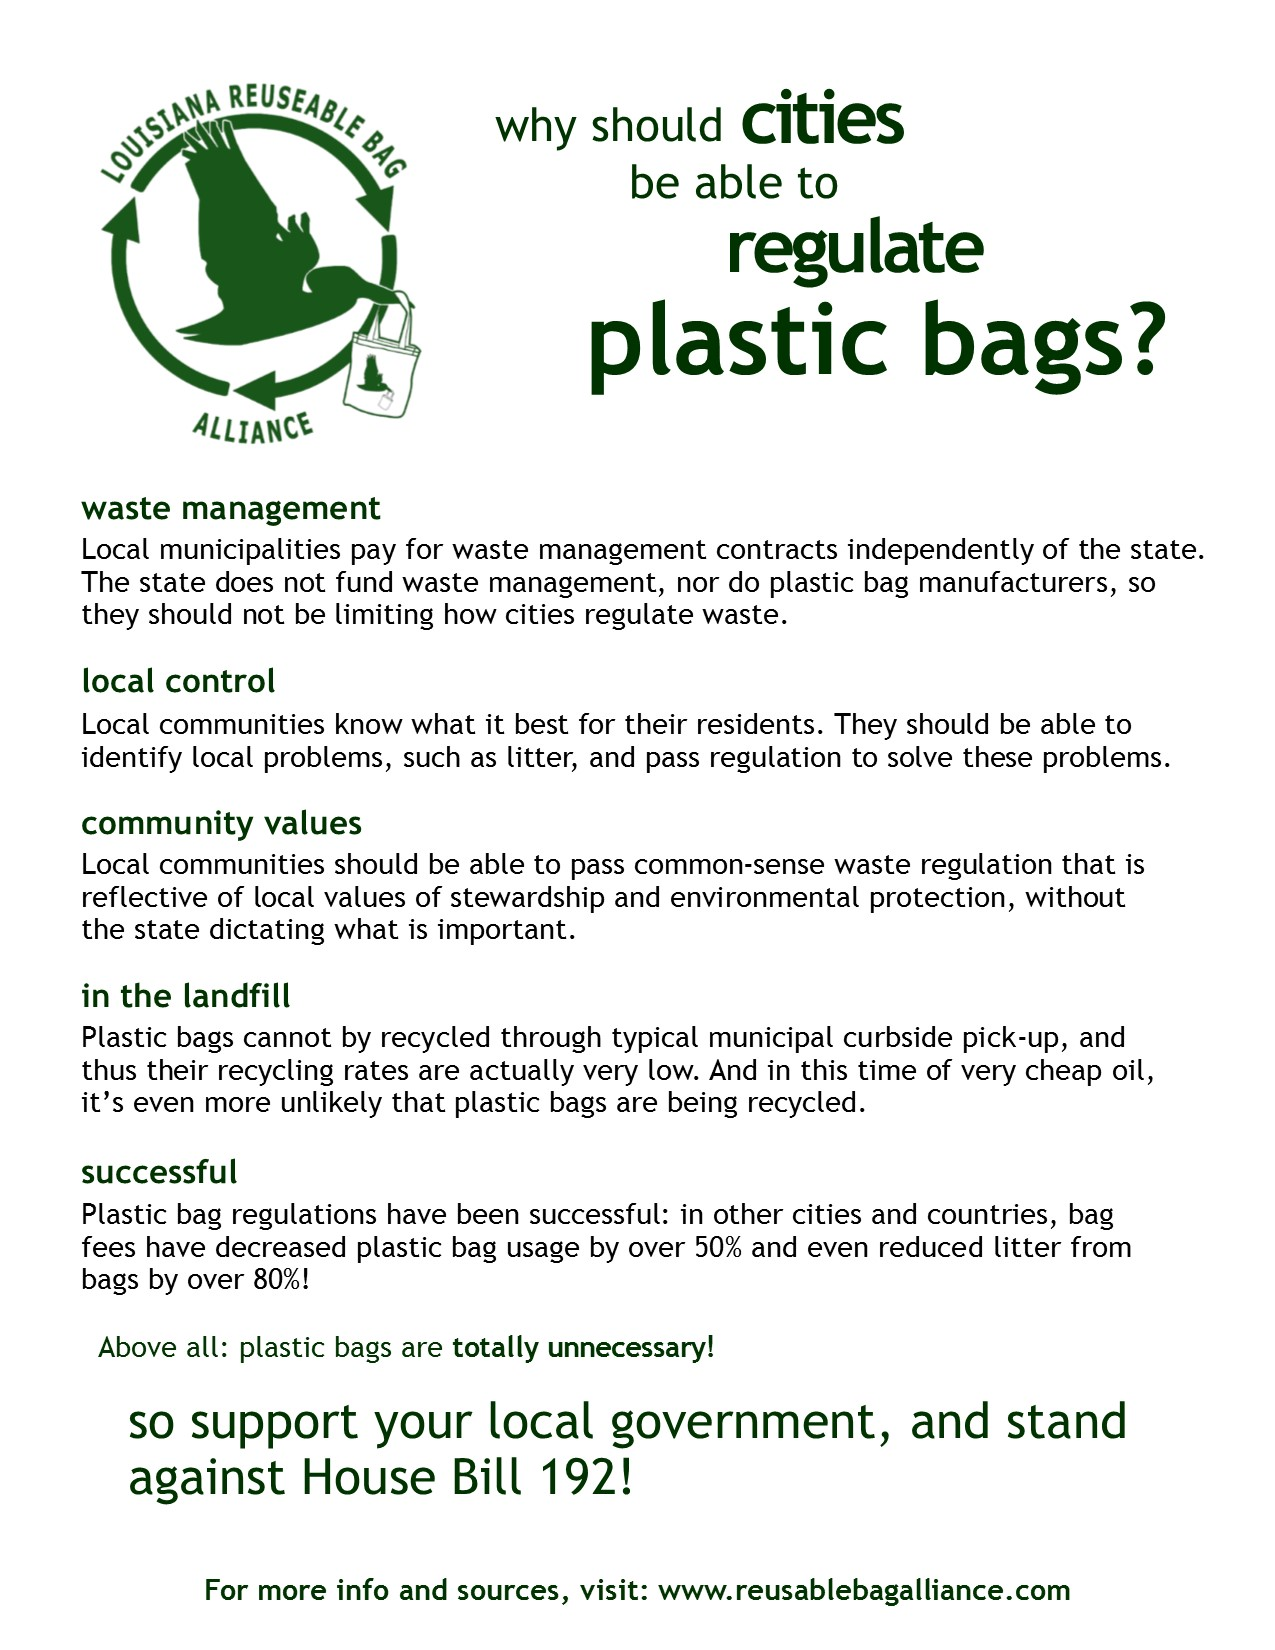 LARBA_one pager on plastic bag regulation